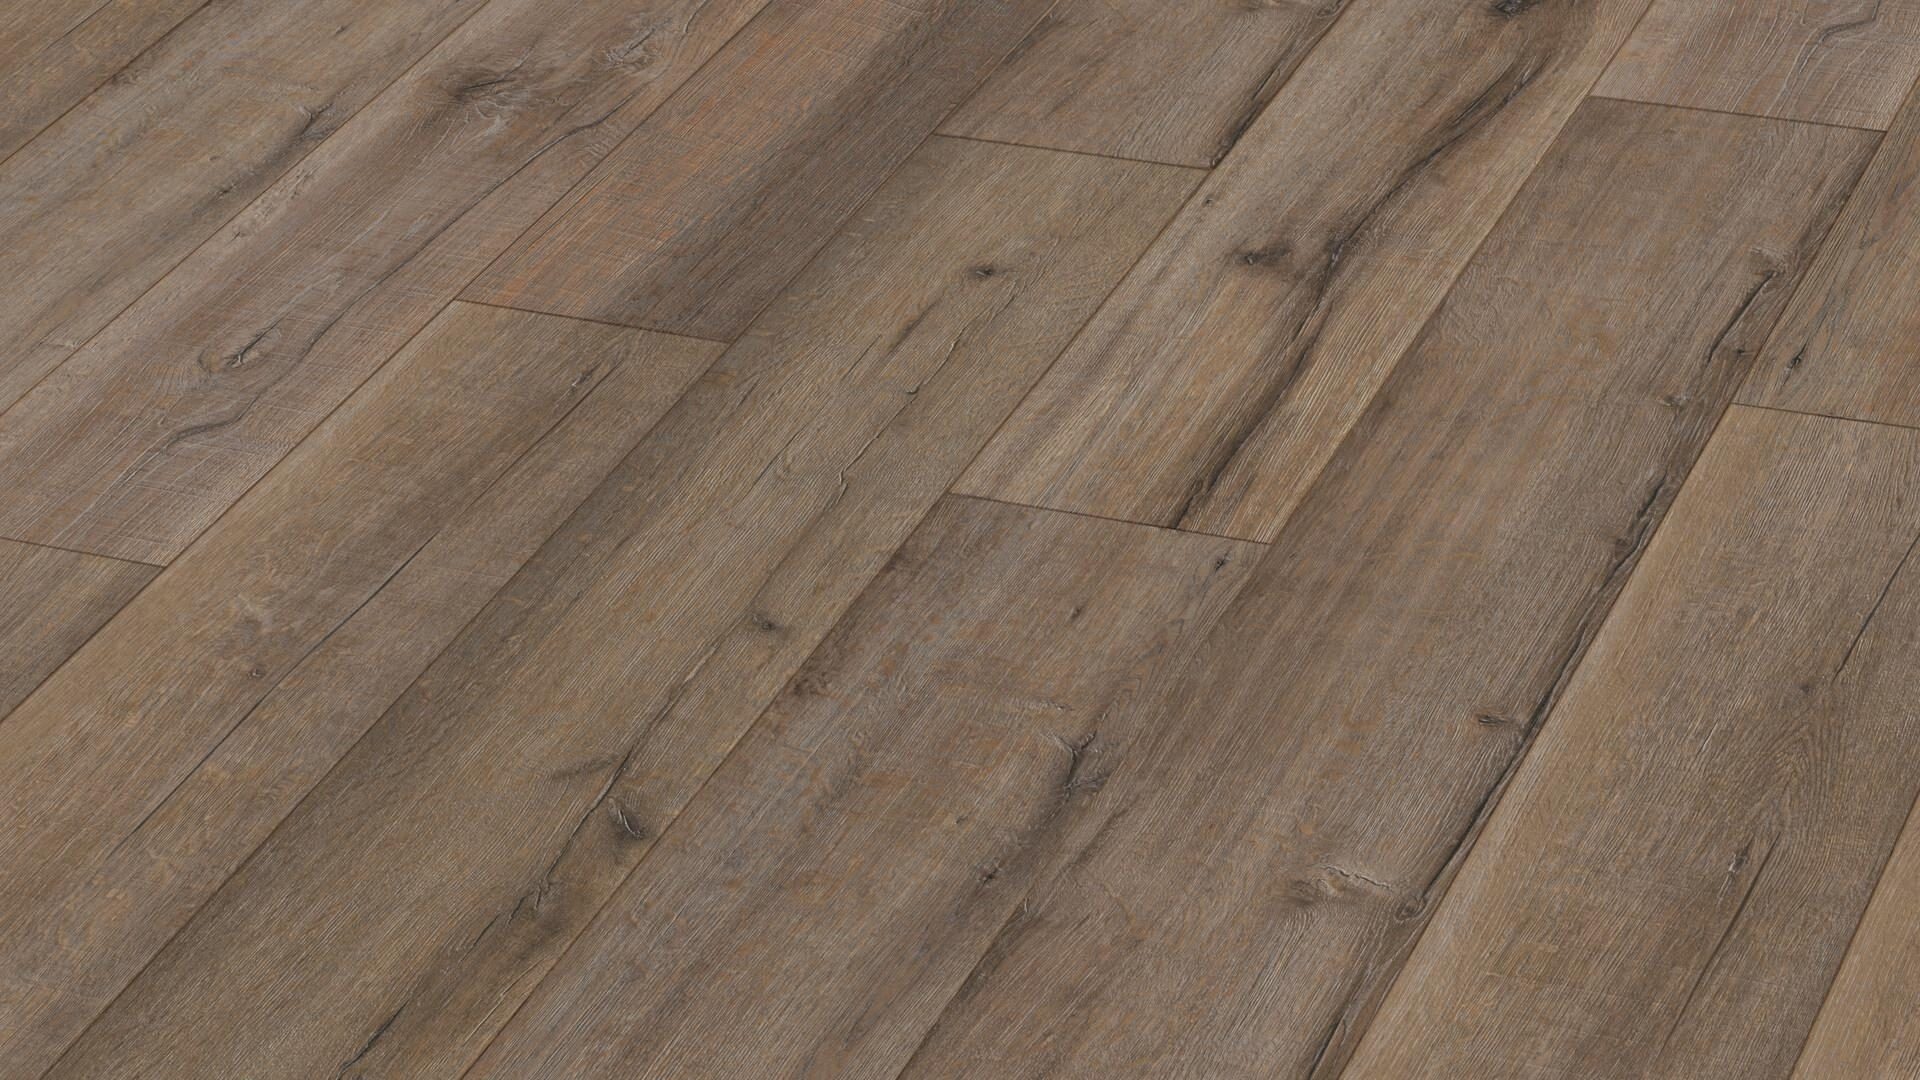 Suelo de diseño MeisterDesign. flex DL 400 Roble madera vieja gris barro 6986